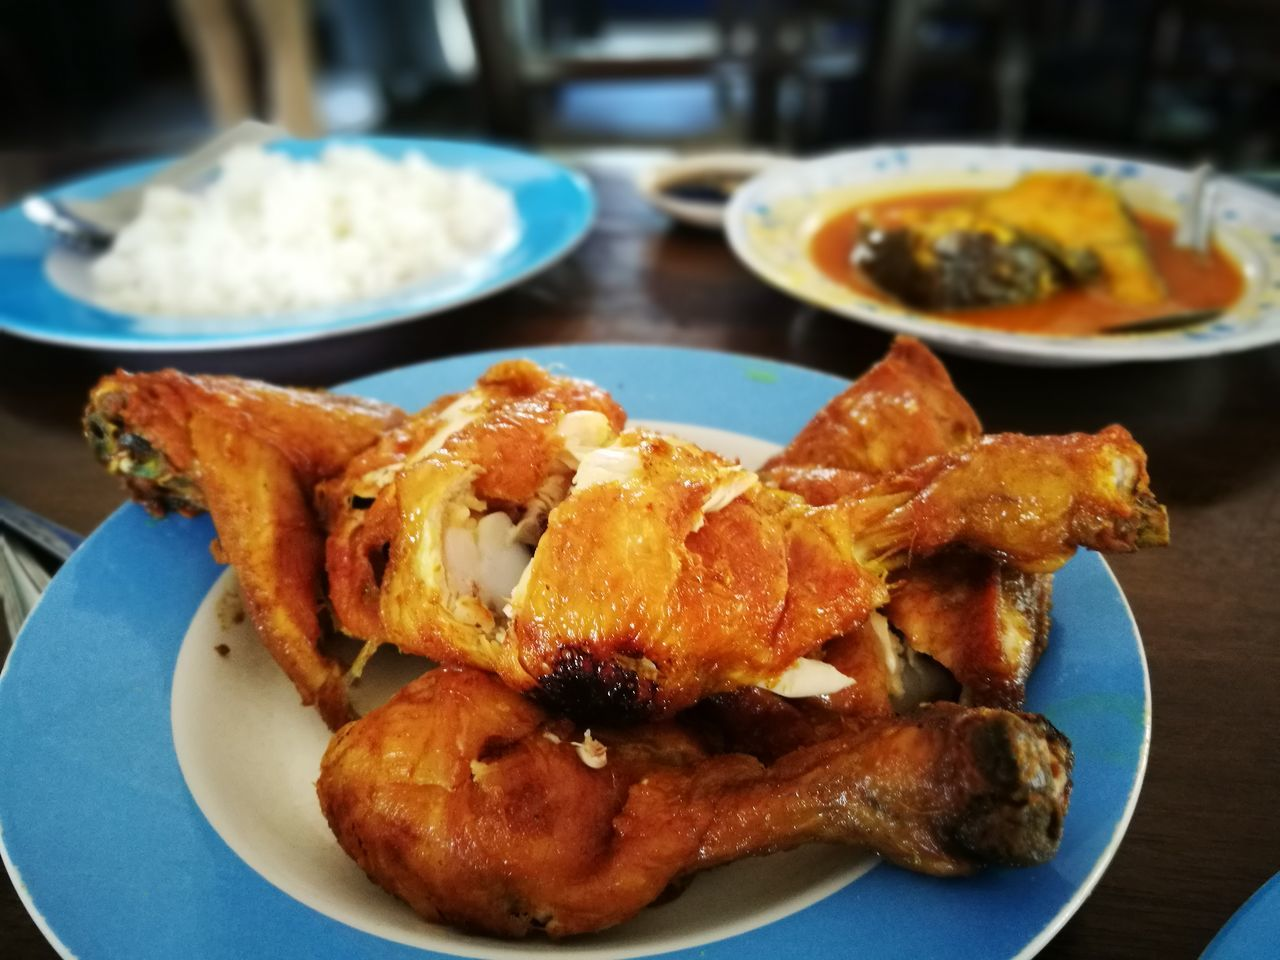 Roast Chicken Food Malaysianfood Culture Localfood Temerloh Pahang, Malaysia